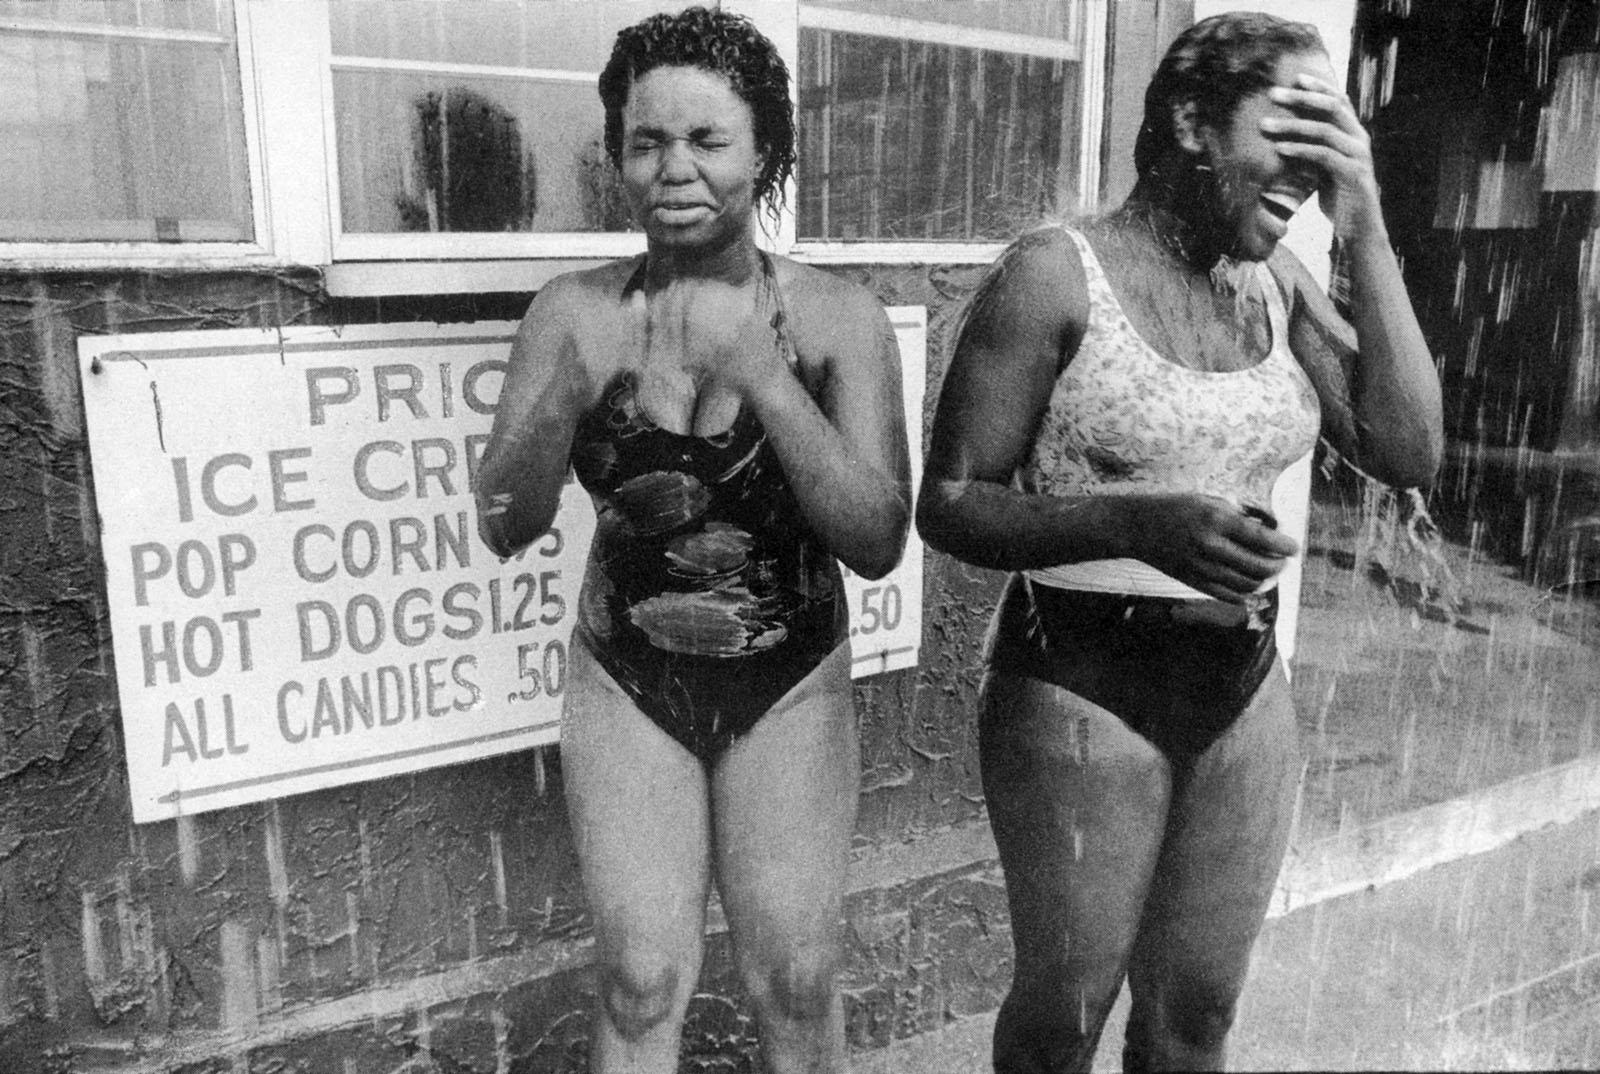 Black History Month Destination 1 of 28: American Beach, Florida